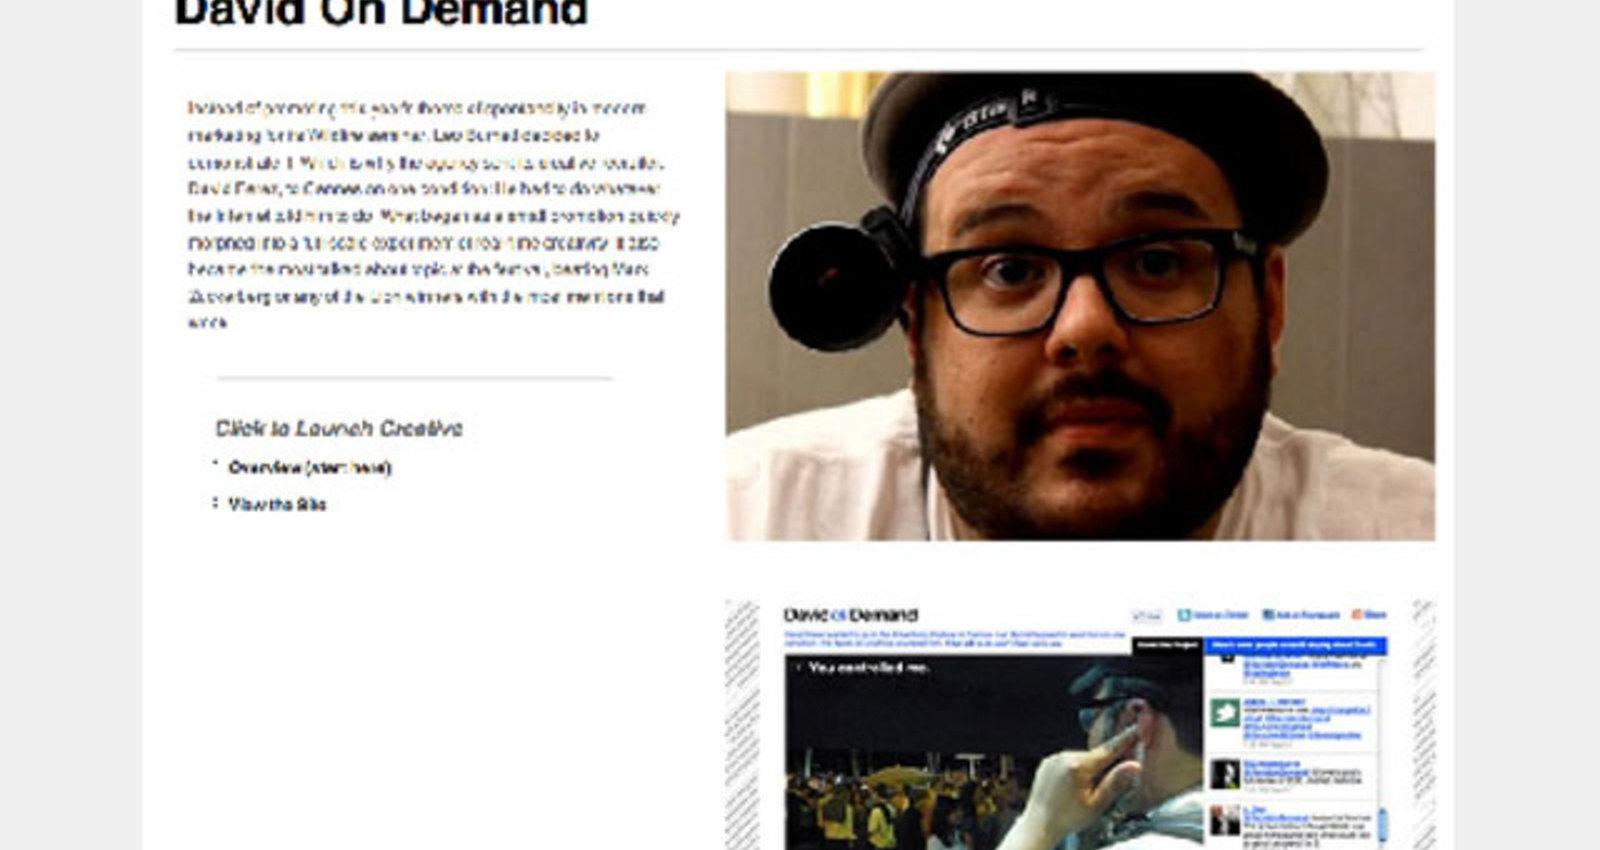 David On Demand